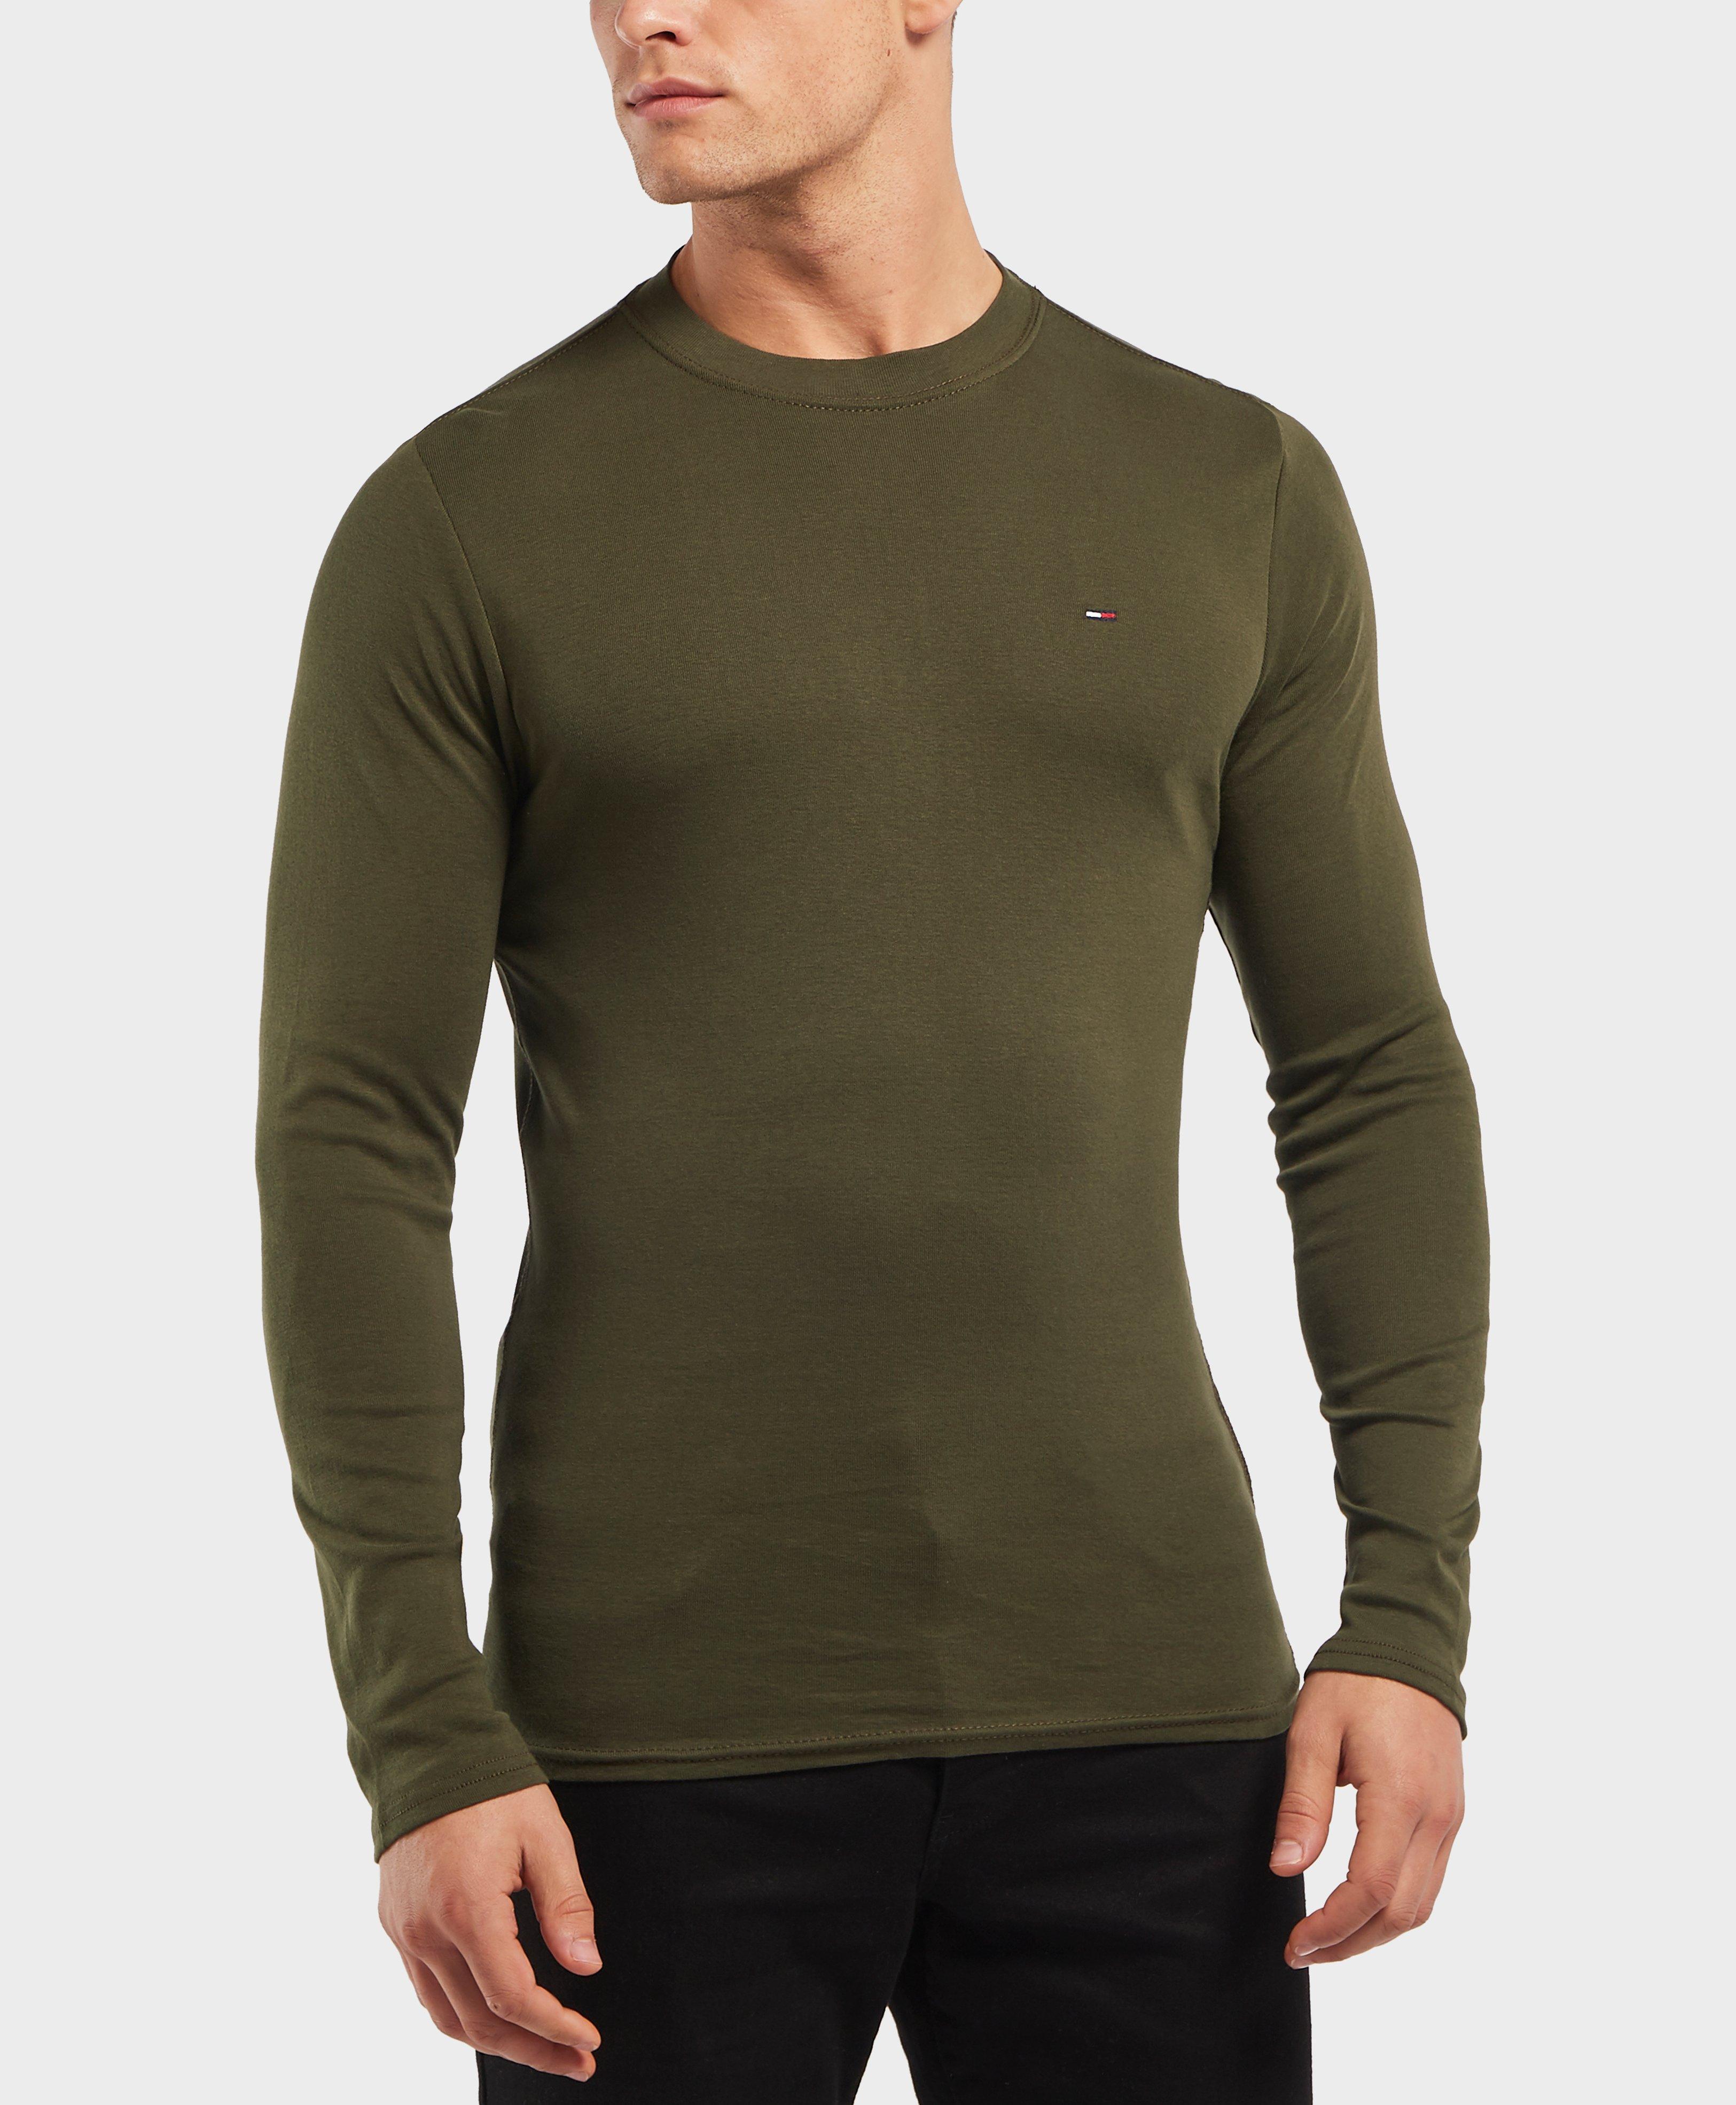 Tommy Hilfiger Long Sleeve Crew T-shirt in Green for Men - Lyst 86c3b42af9